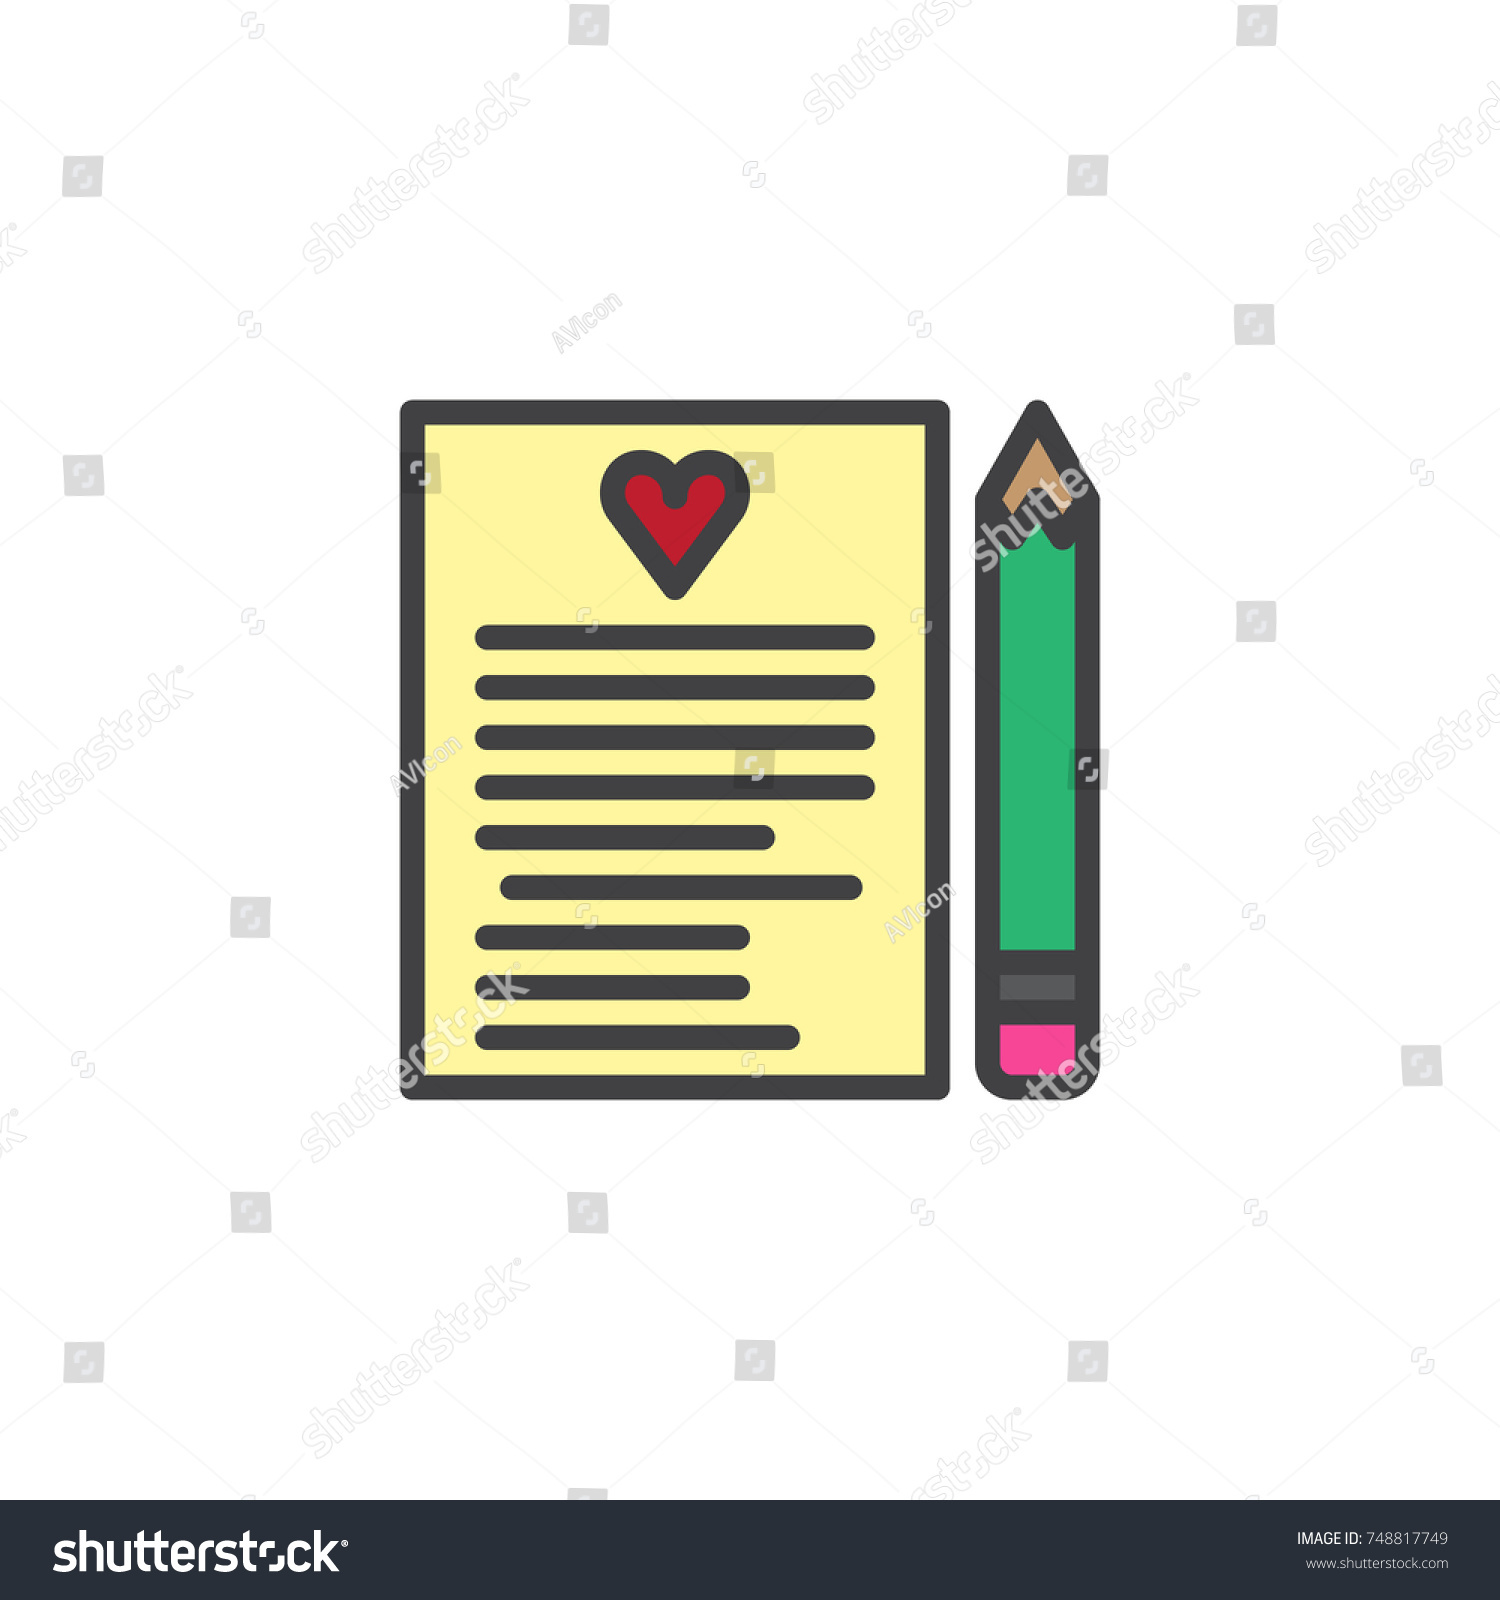 Love letter heart pen filled outline stock vector 748817749 love letter heart pen filled outline stock vector 748817749 shutterstock biocorpaavc